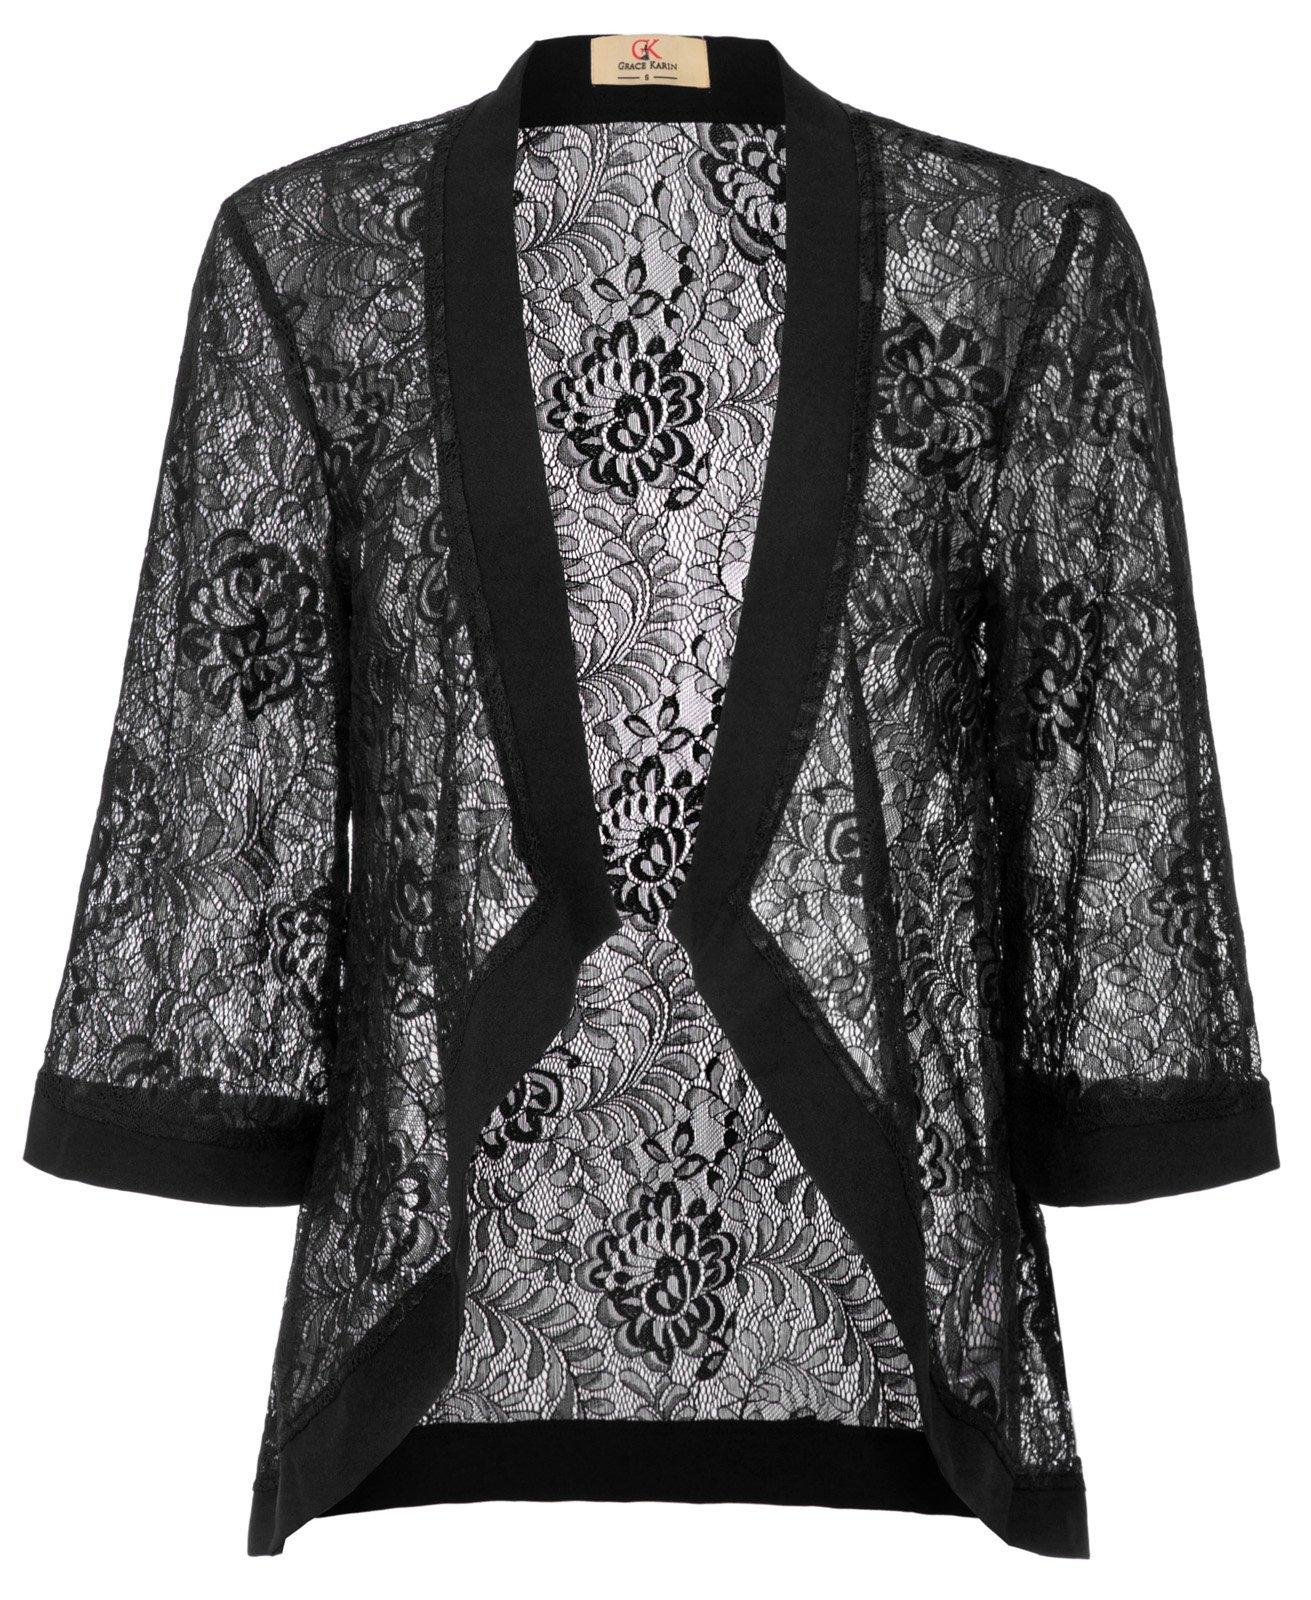 GRACE KARIN Summer Lightweight Beach Cardigan Coverup Lace Blouse(XL, Black 83)